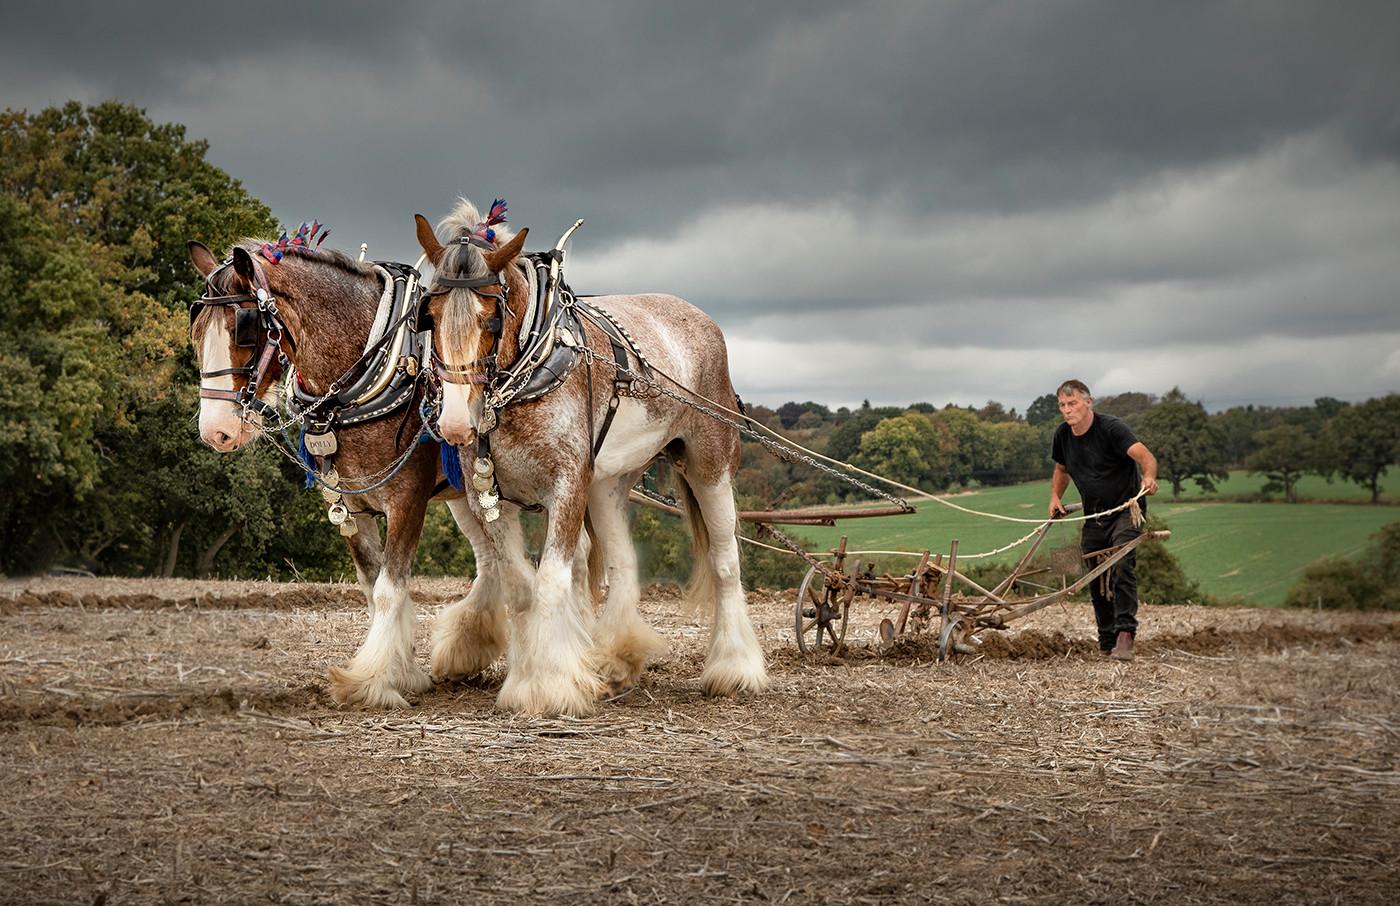 17 PLOUGHING BY HEAVY HORSES by David Peek